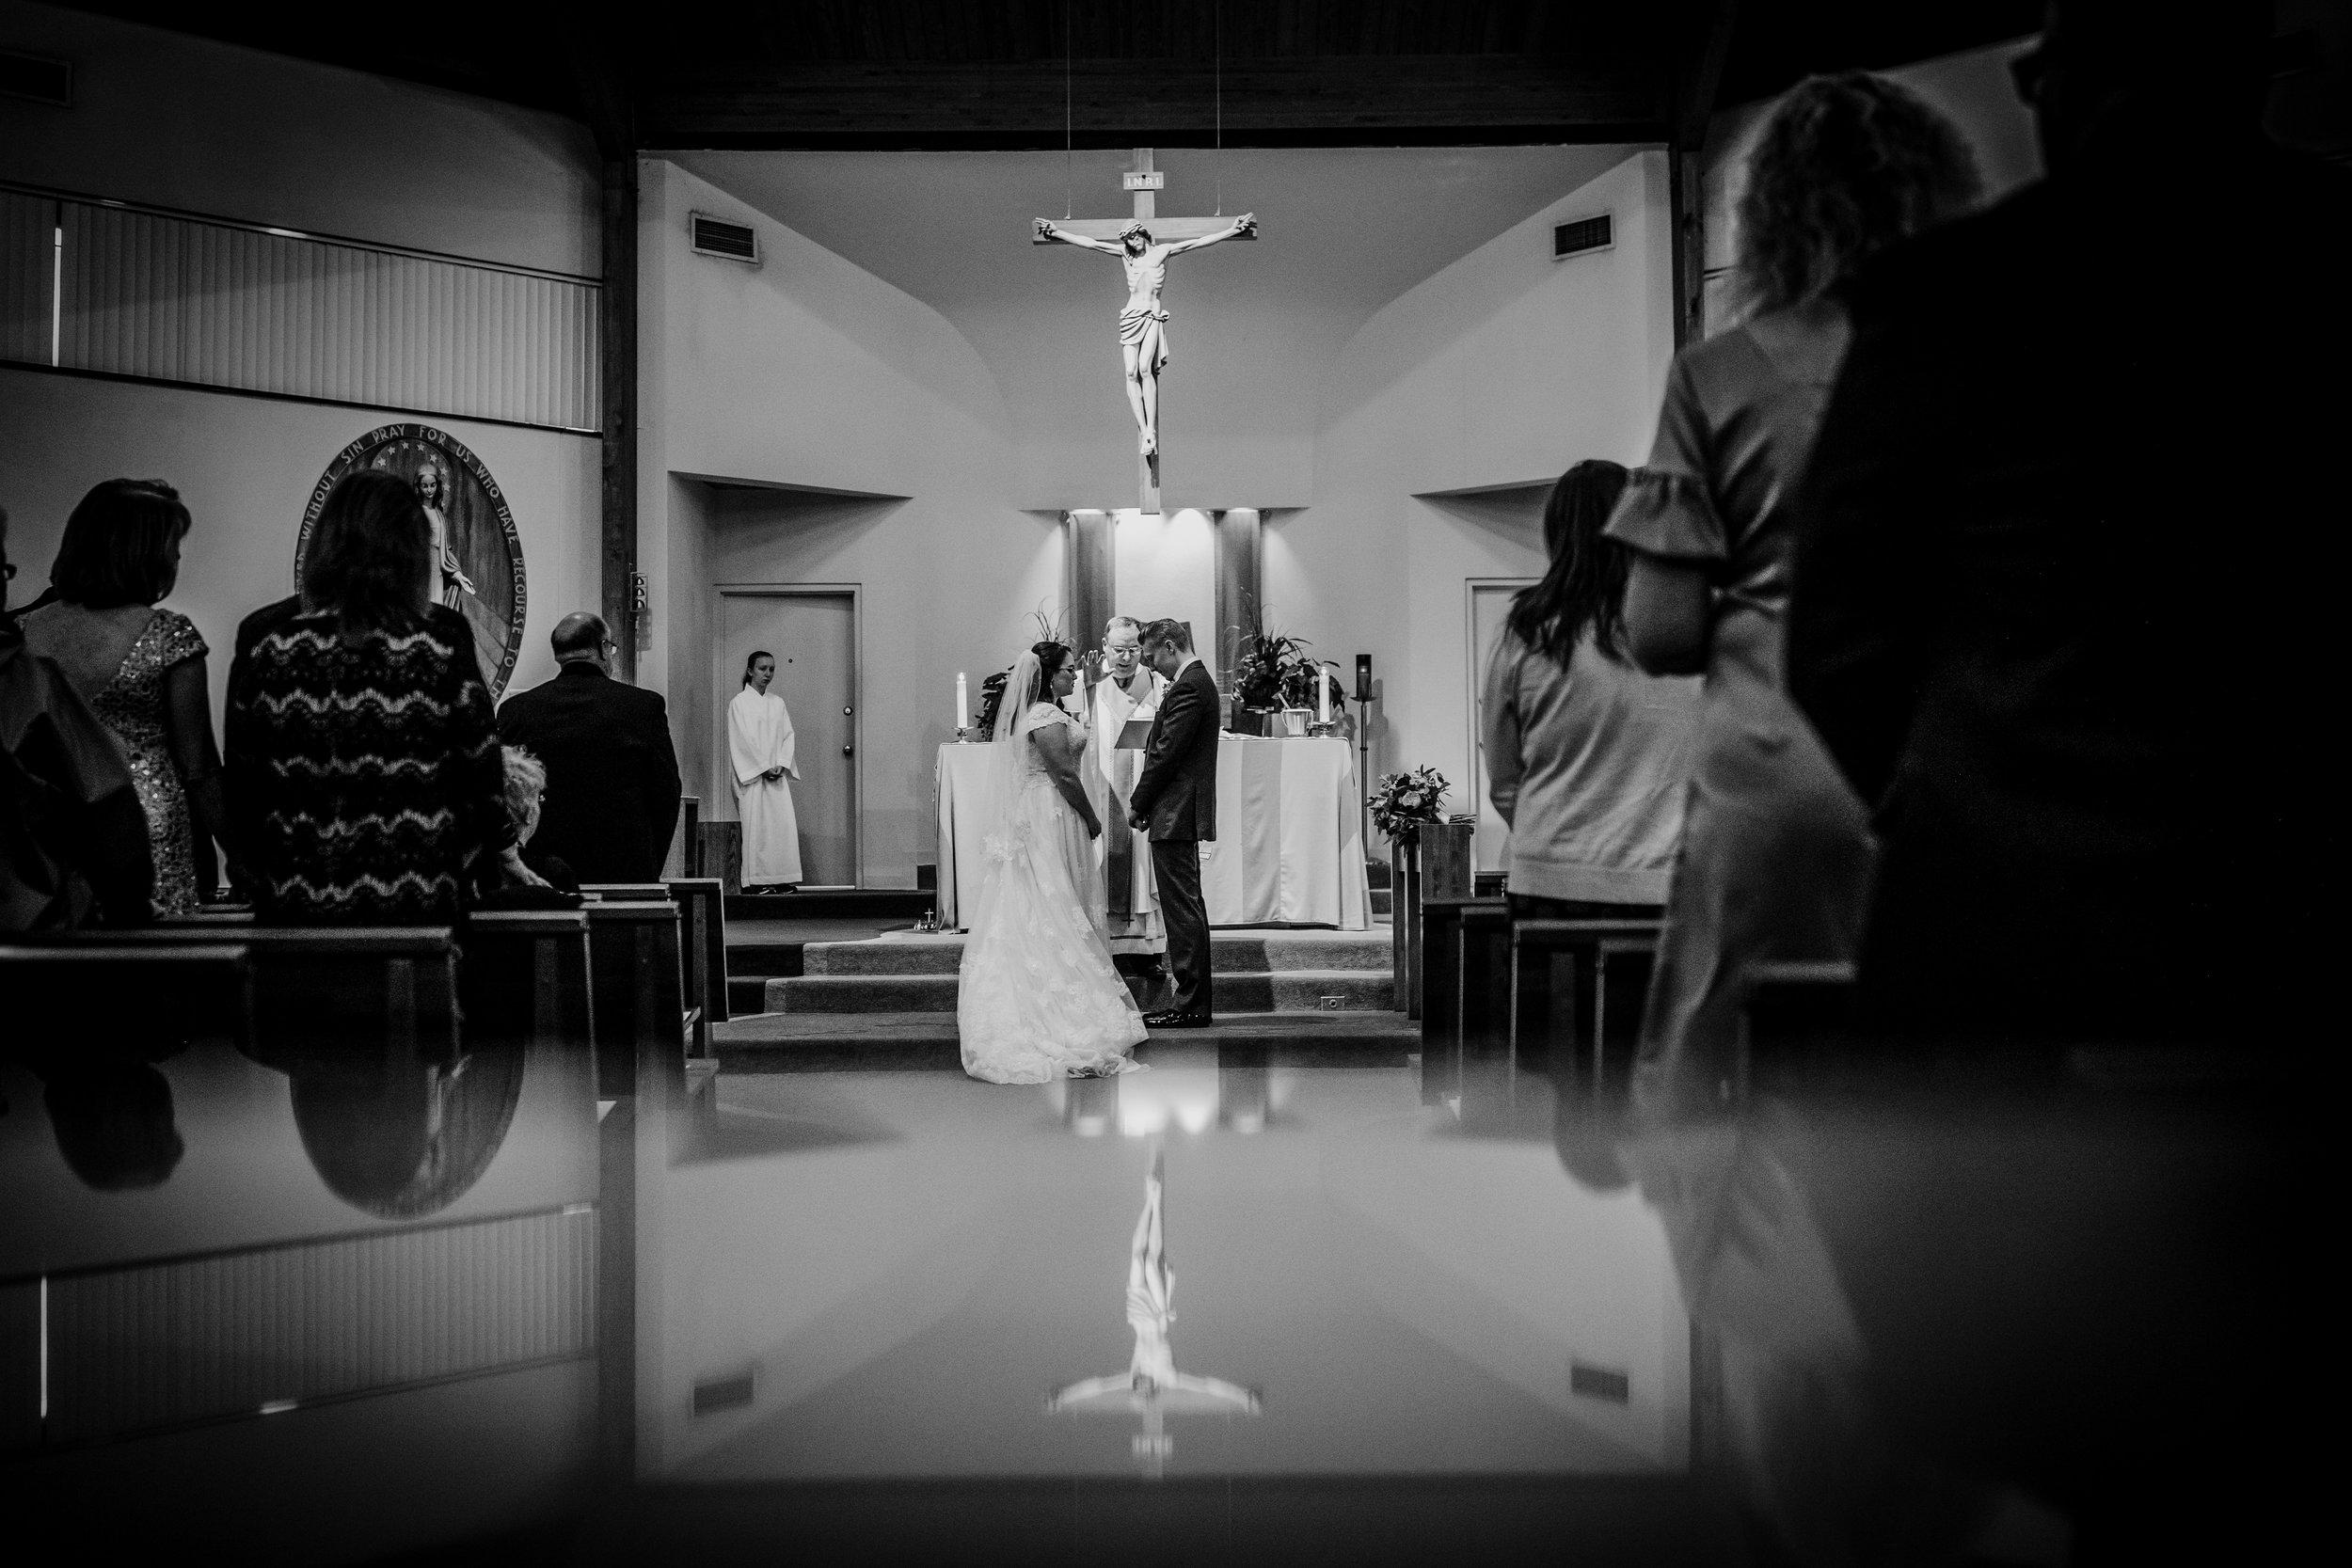 New-Jersey-Wedding-Photography-Fishers-Tudor-House-JennaLynnPhotography-CeremonyBW-Kathleen&Eddie-45.jpg